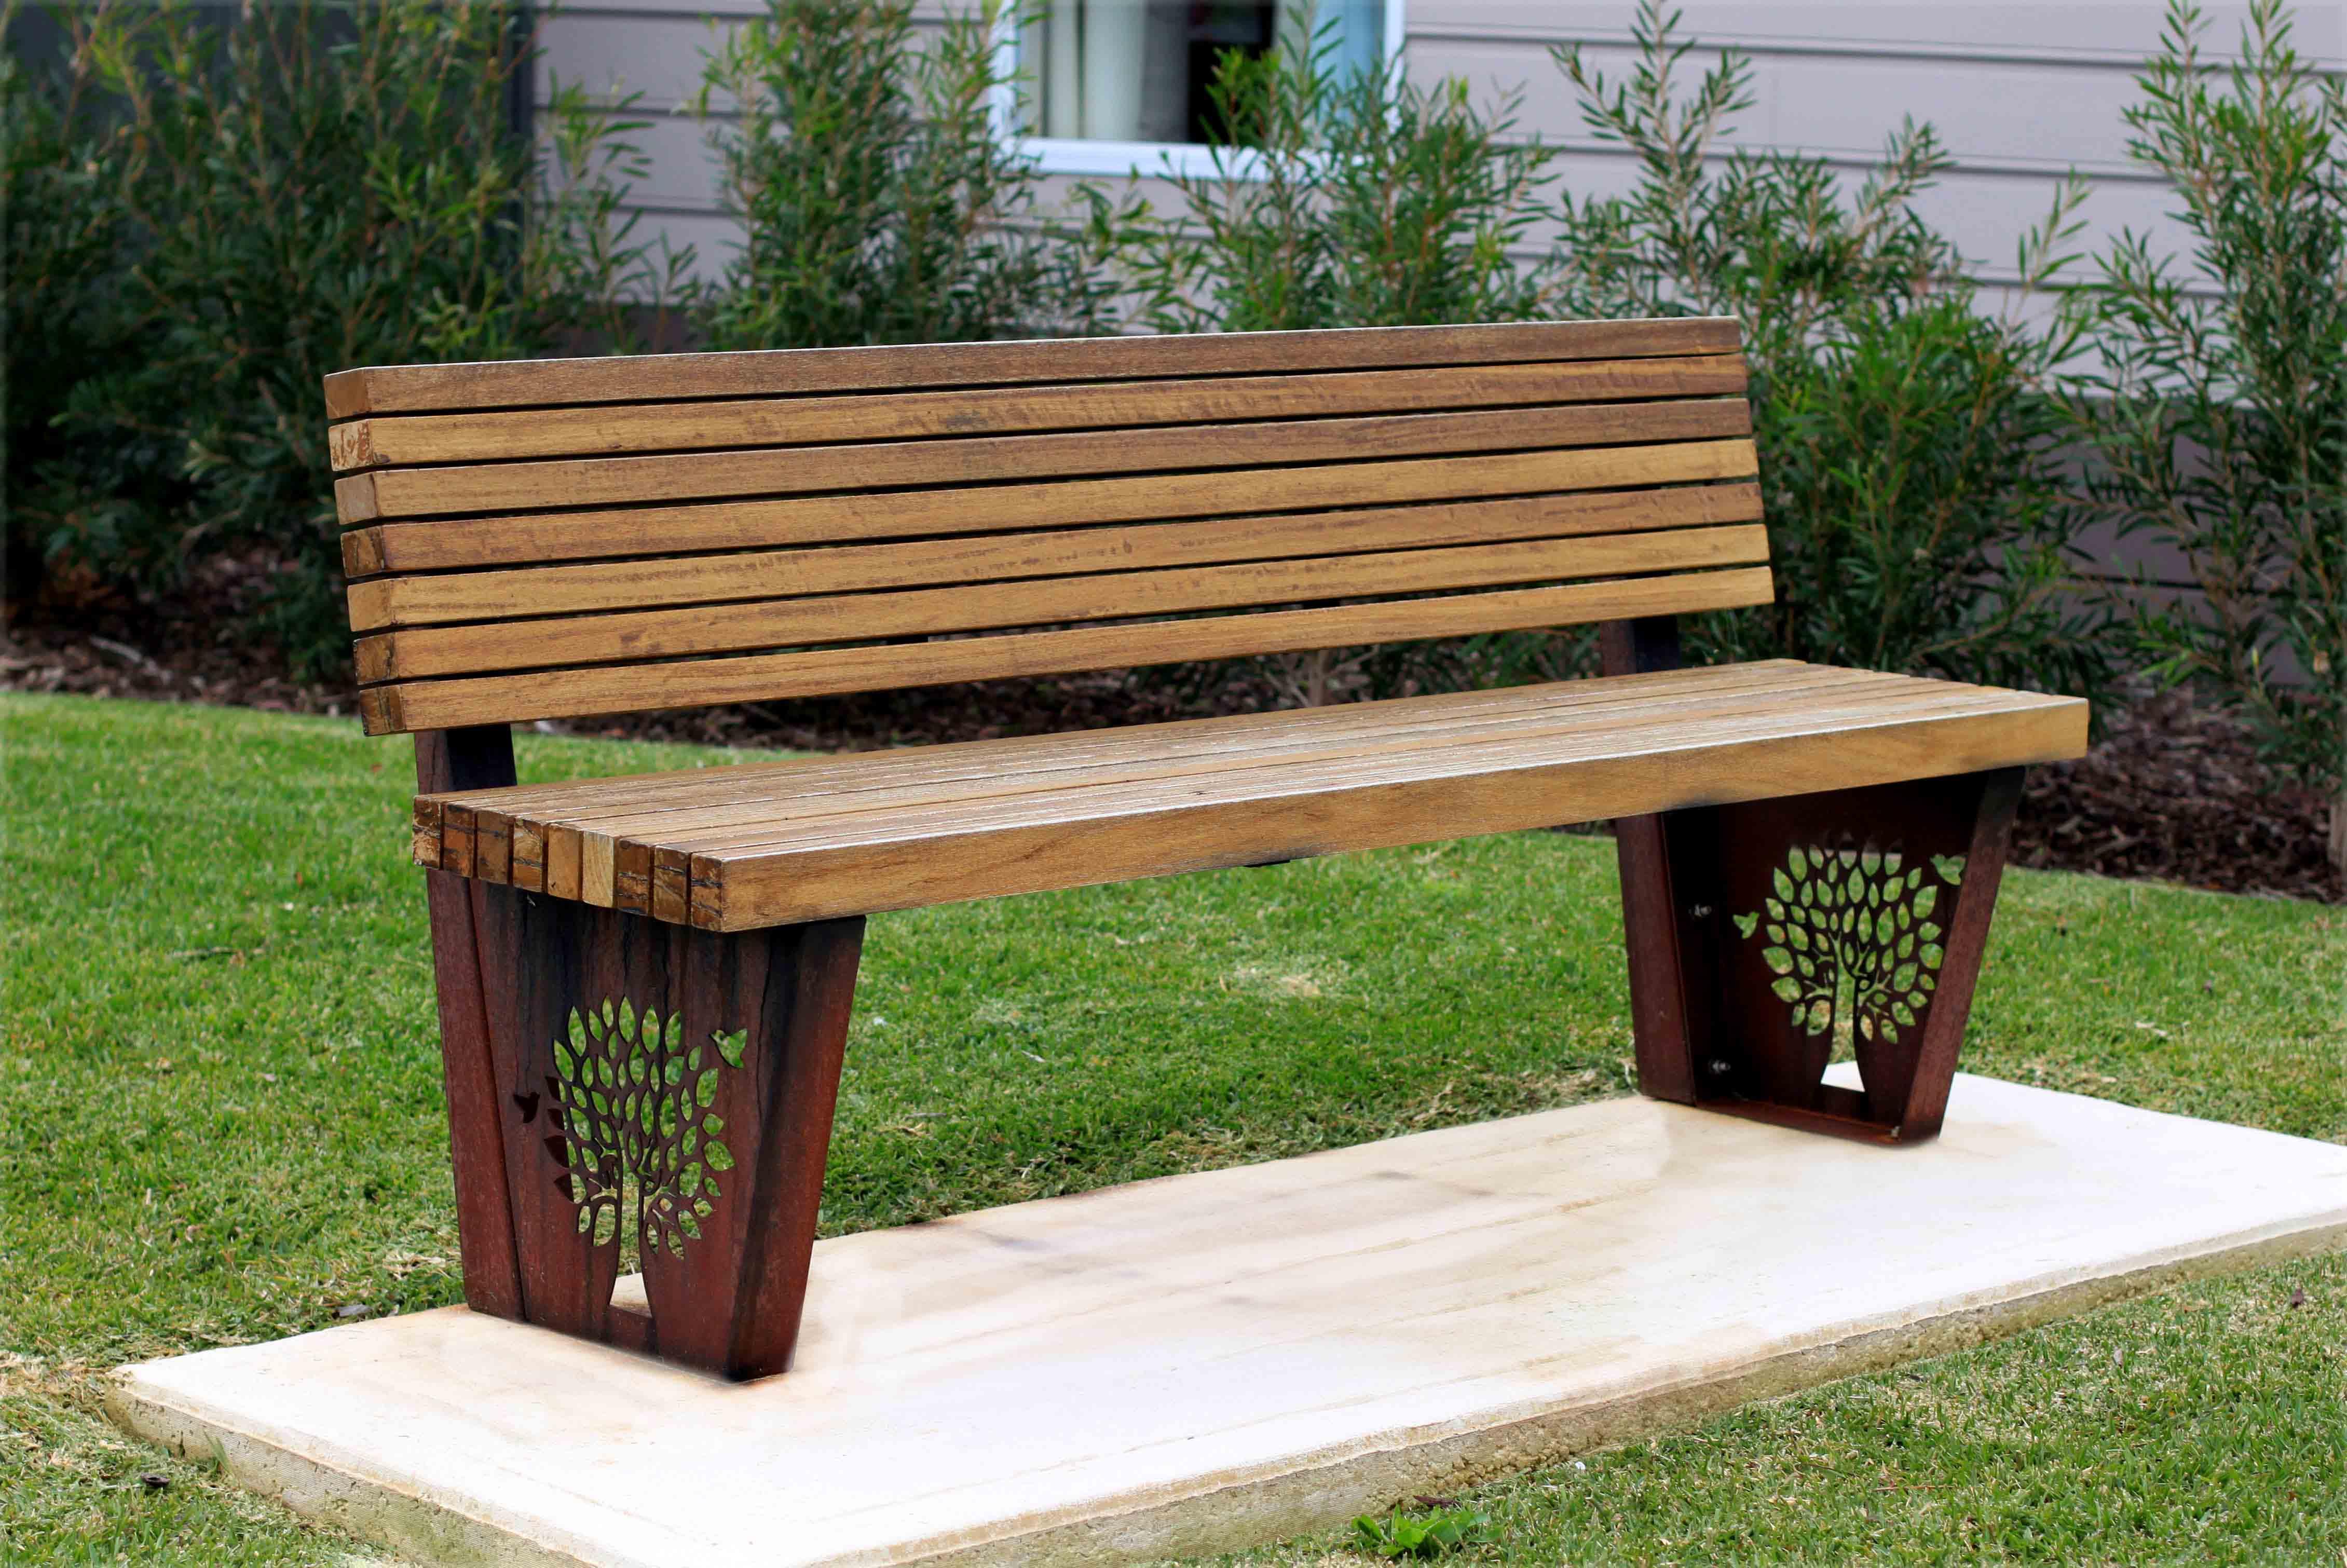 TM4551 (Rustic Corten frame, Australian hardwood timber)